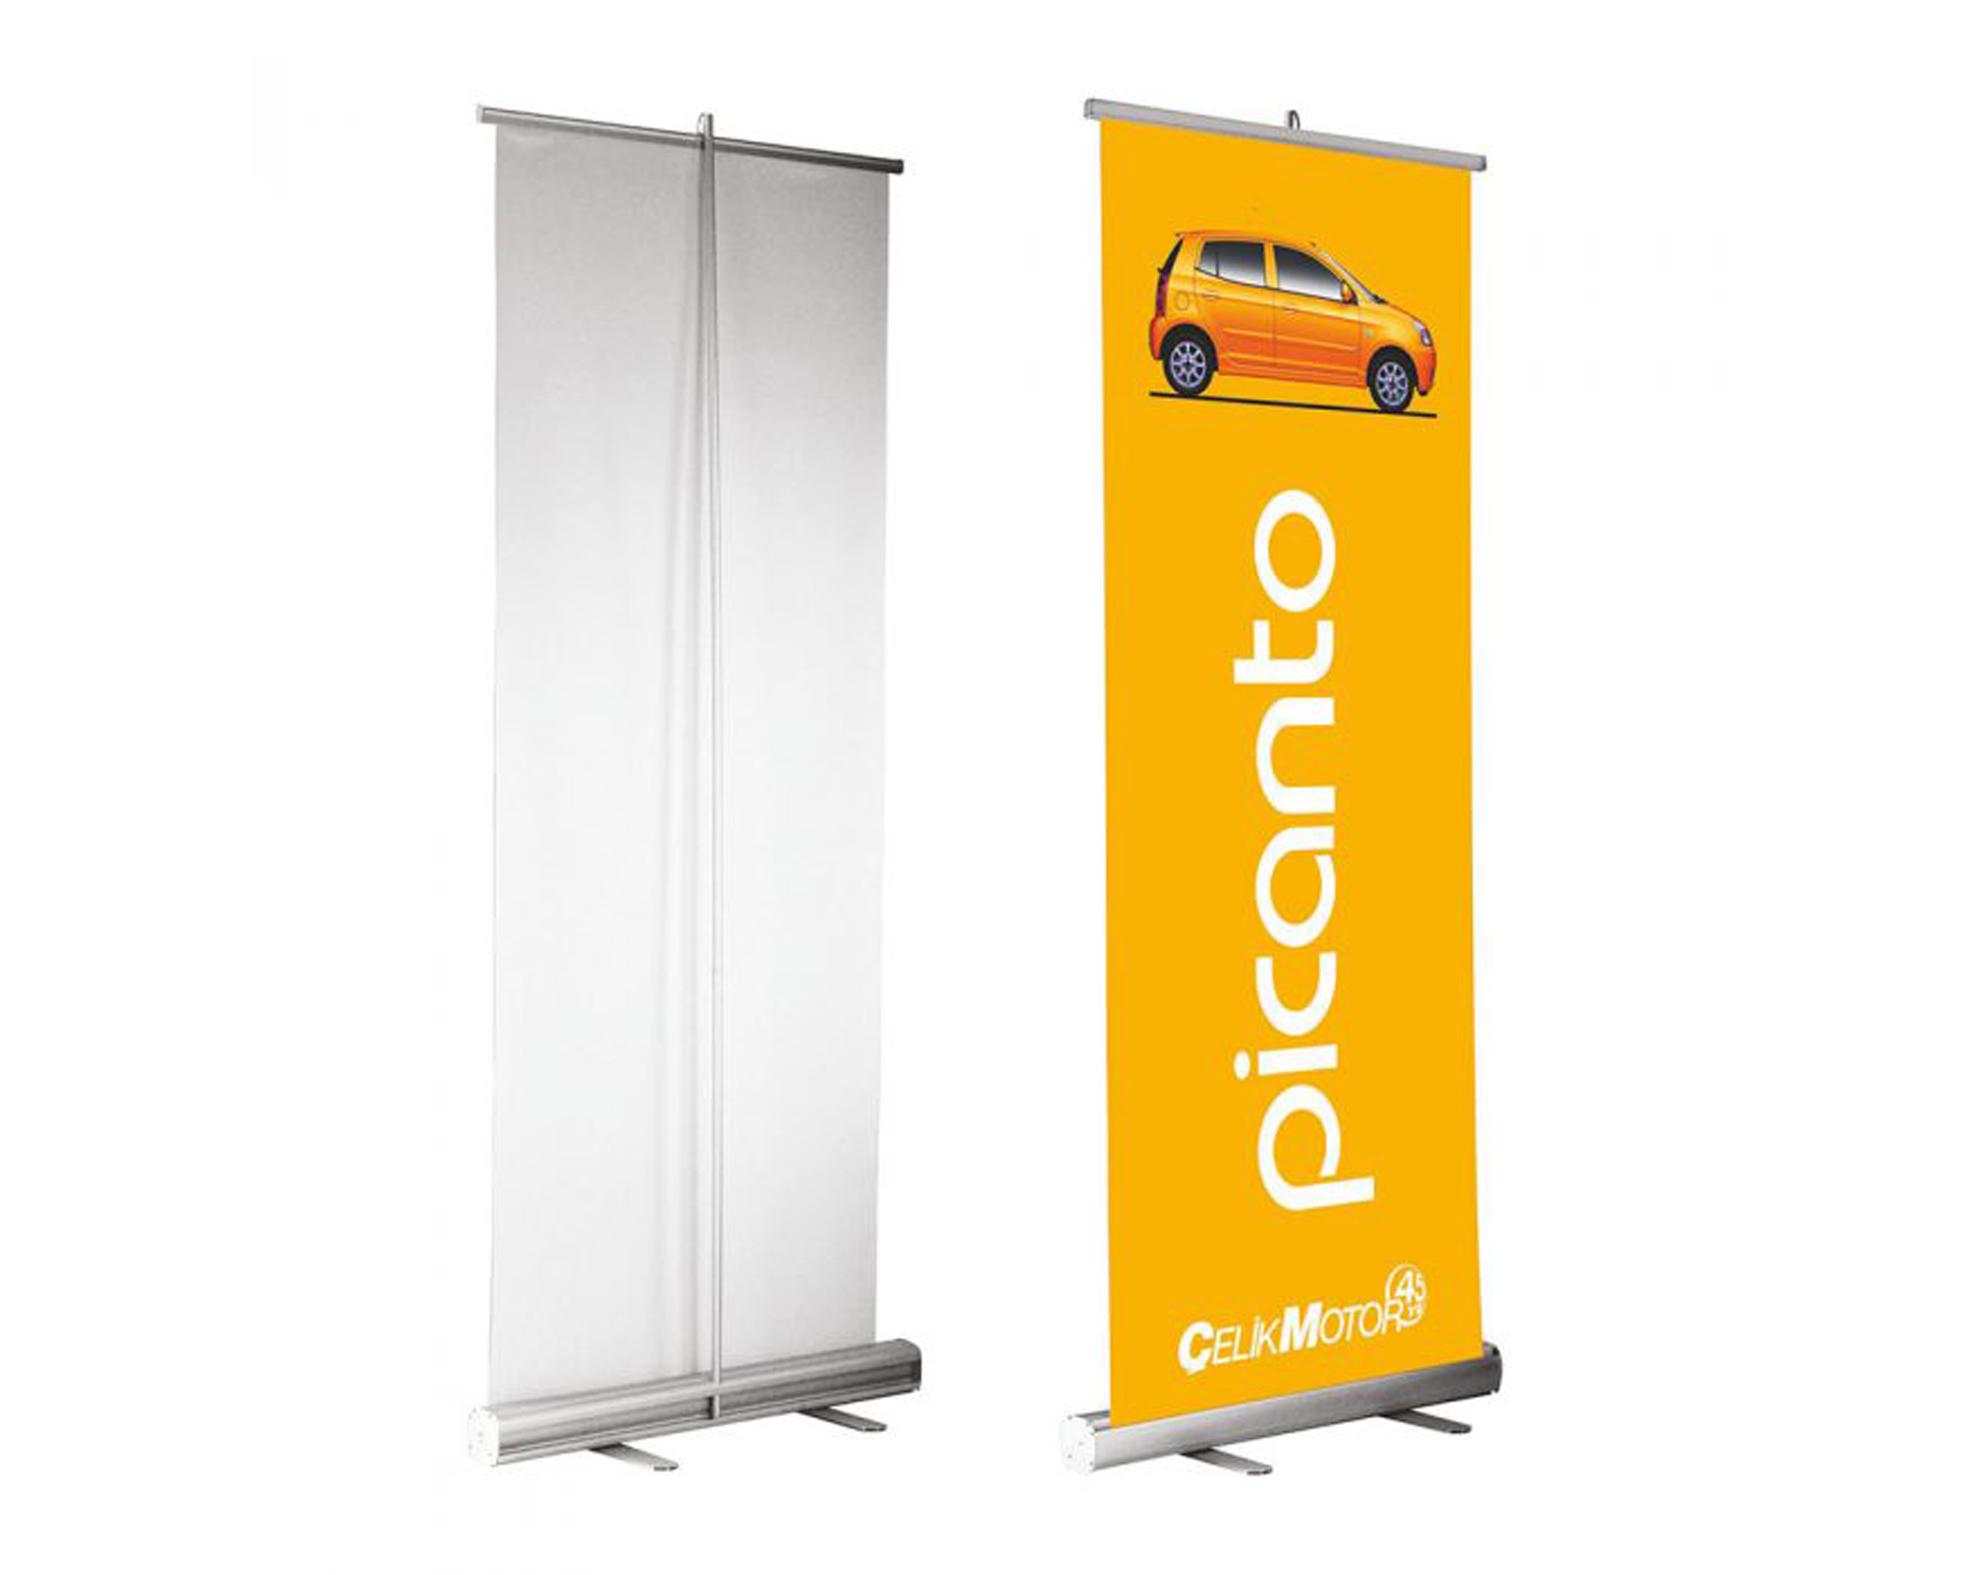 Eko-Roll-up-Banner-1-700x700